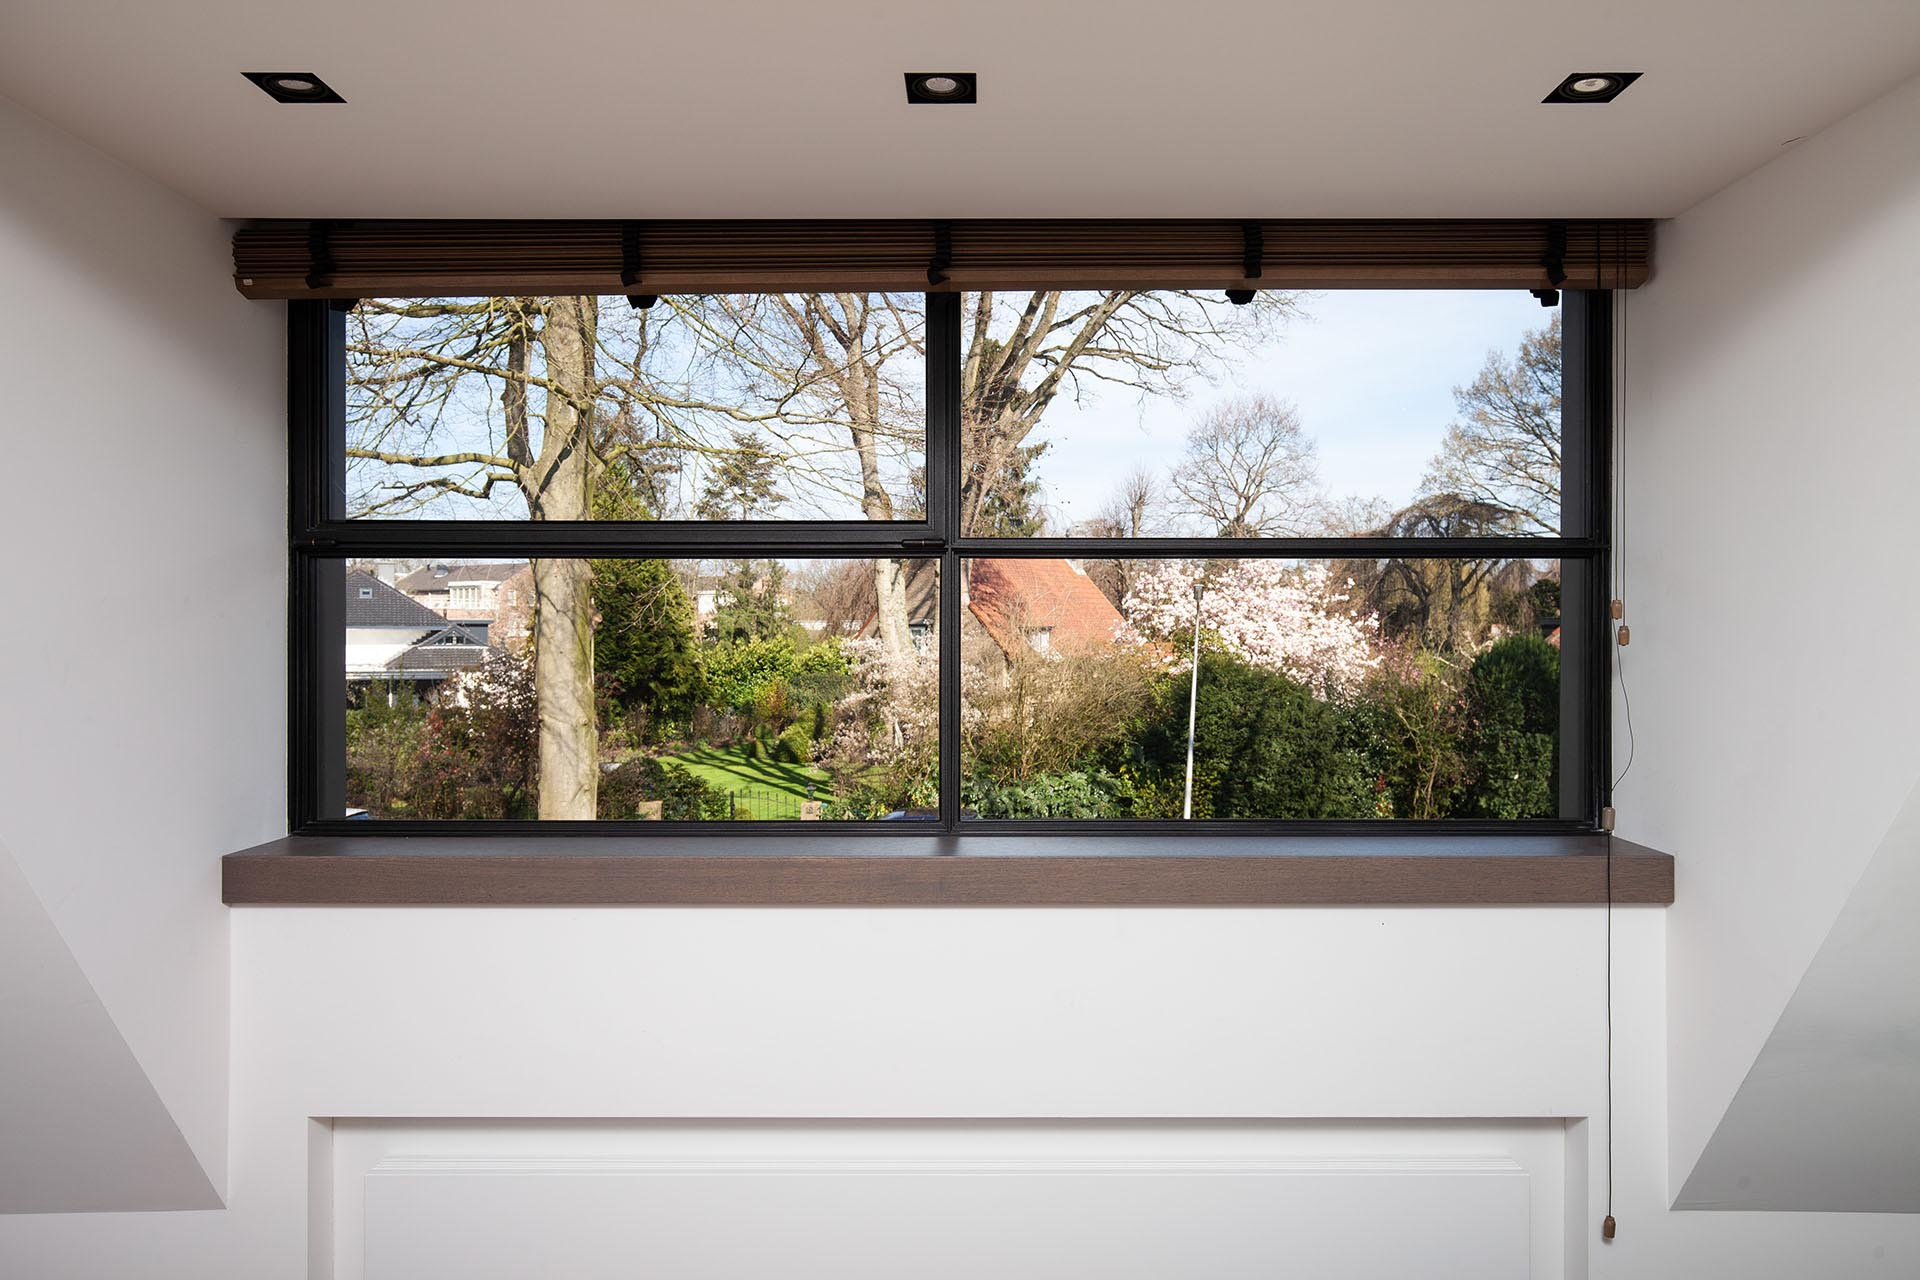 MHB steel awning window overlooking a Dutch village